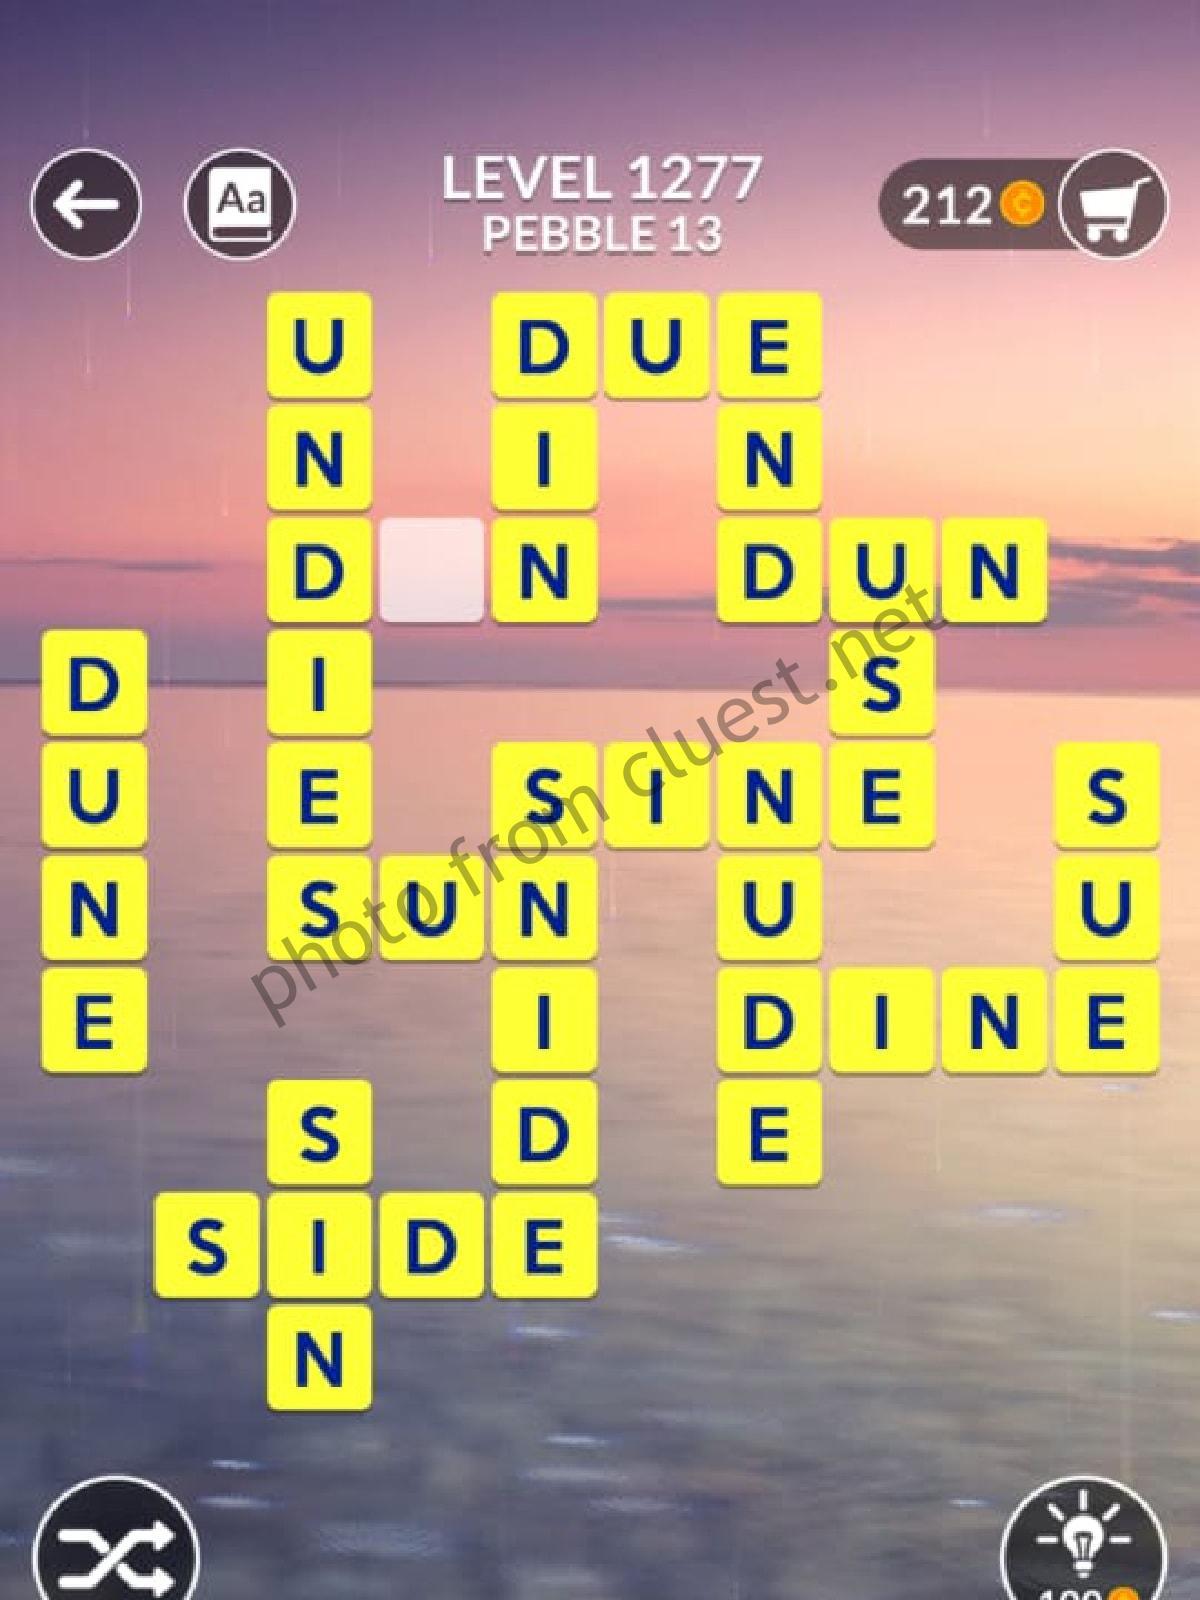 Wordscapes Level 1277 Pebble 13 Answers Cluest